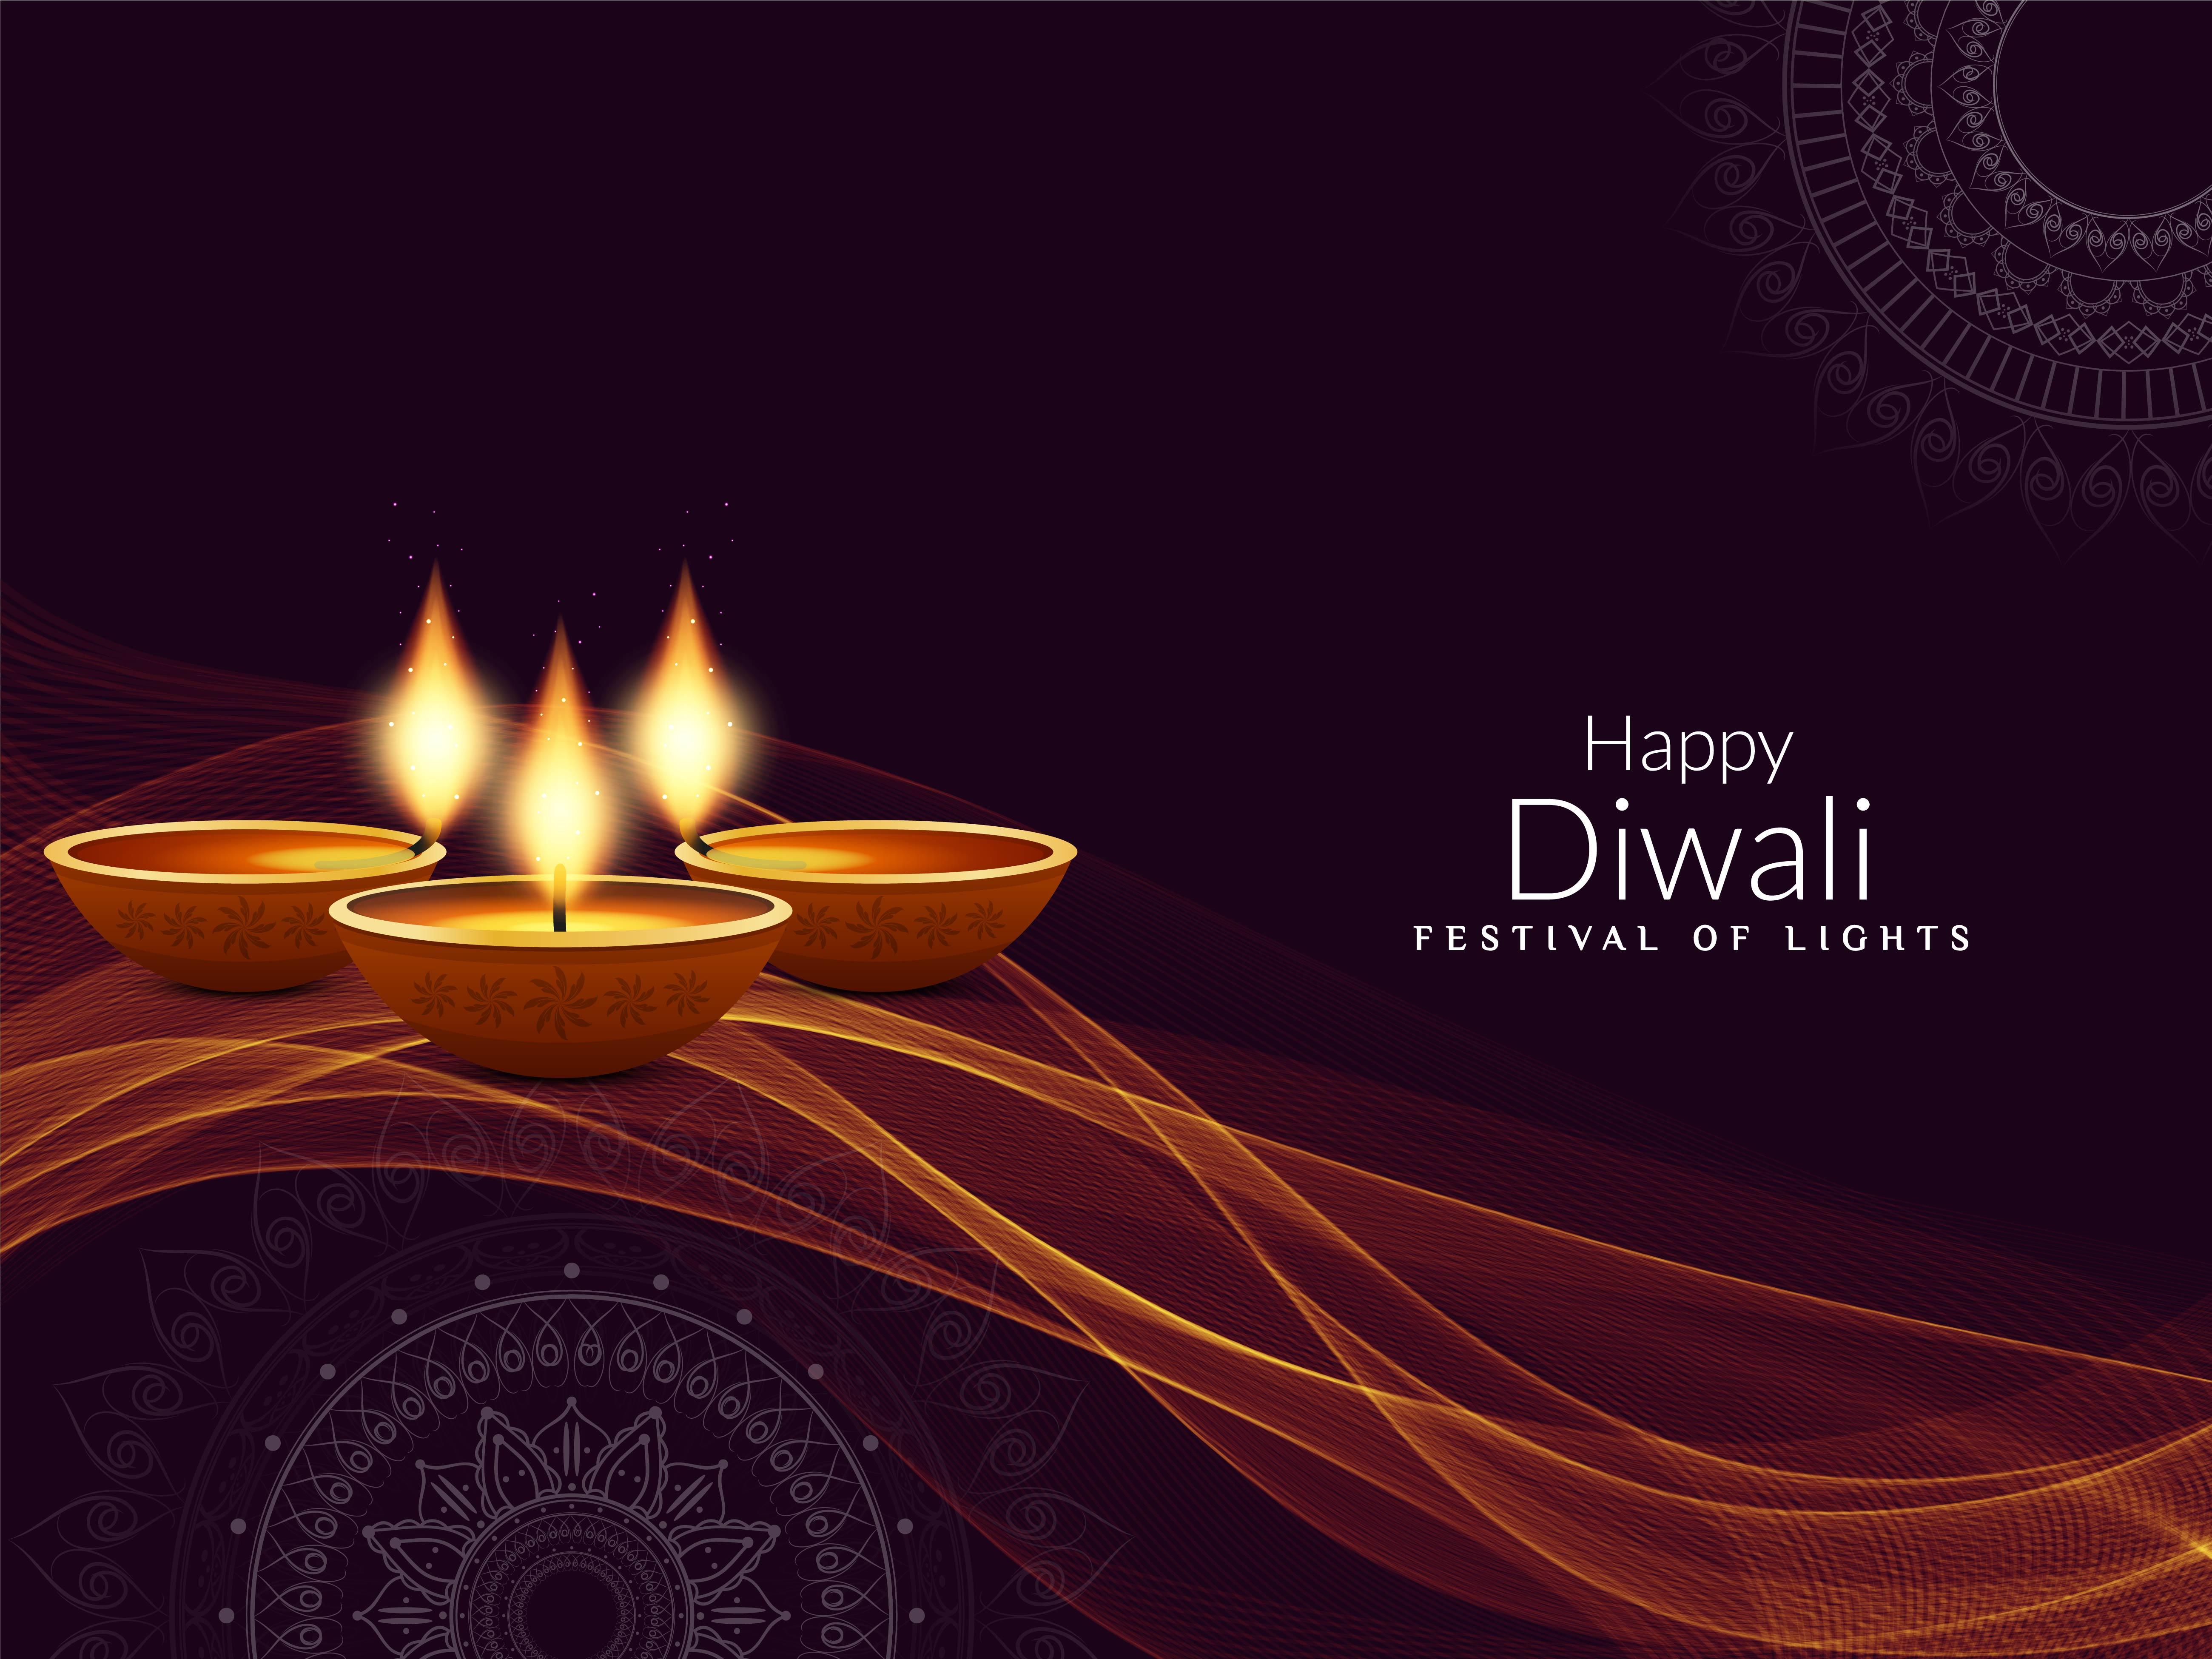 Diya Wallpaper Hd Abstract Happy Diwali Religious Elegant Background